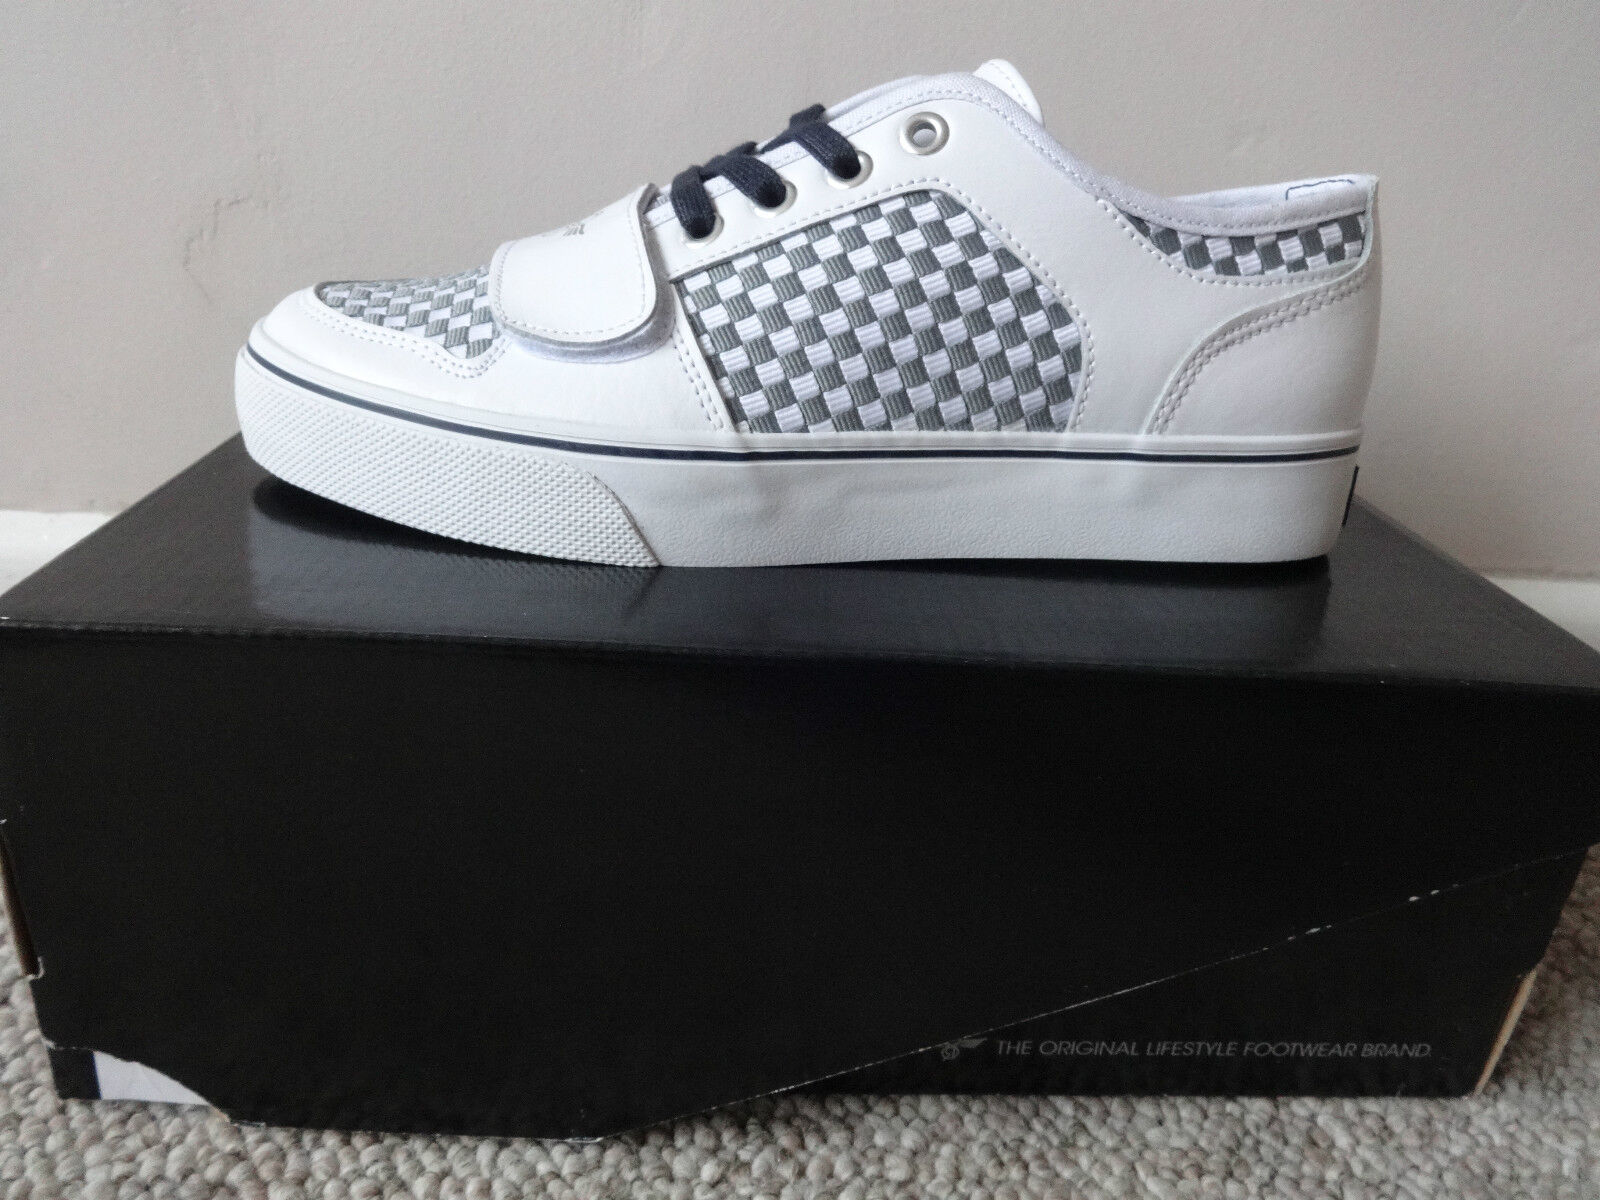 Creative Recreations Cesario UVCR4LO14 new Hombre Zapatos trainers Blanco new UVCR4LO14 with box. 52c119